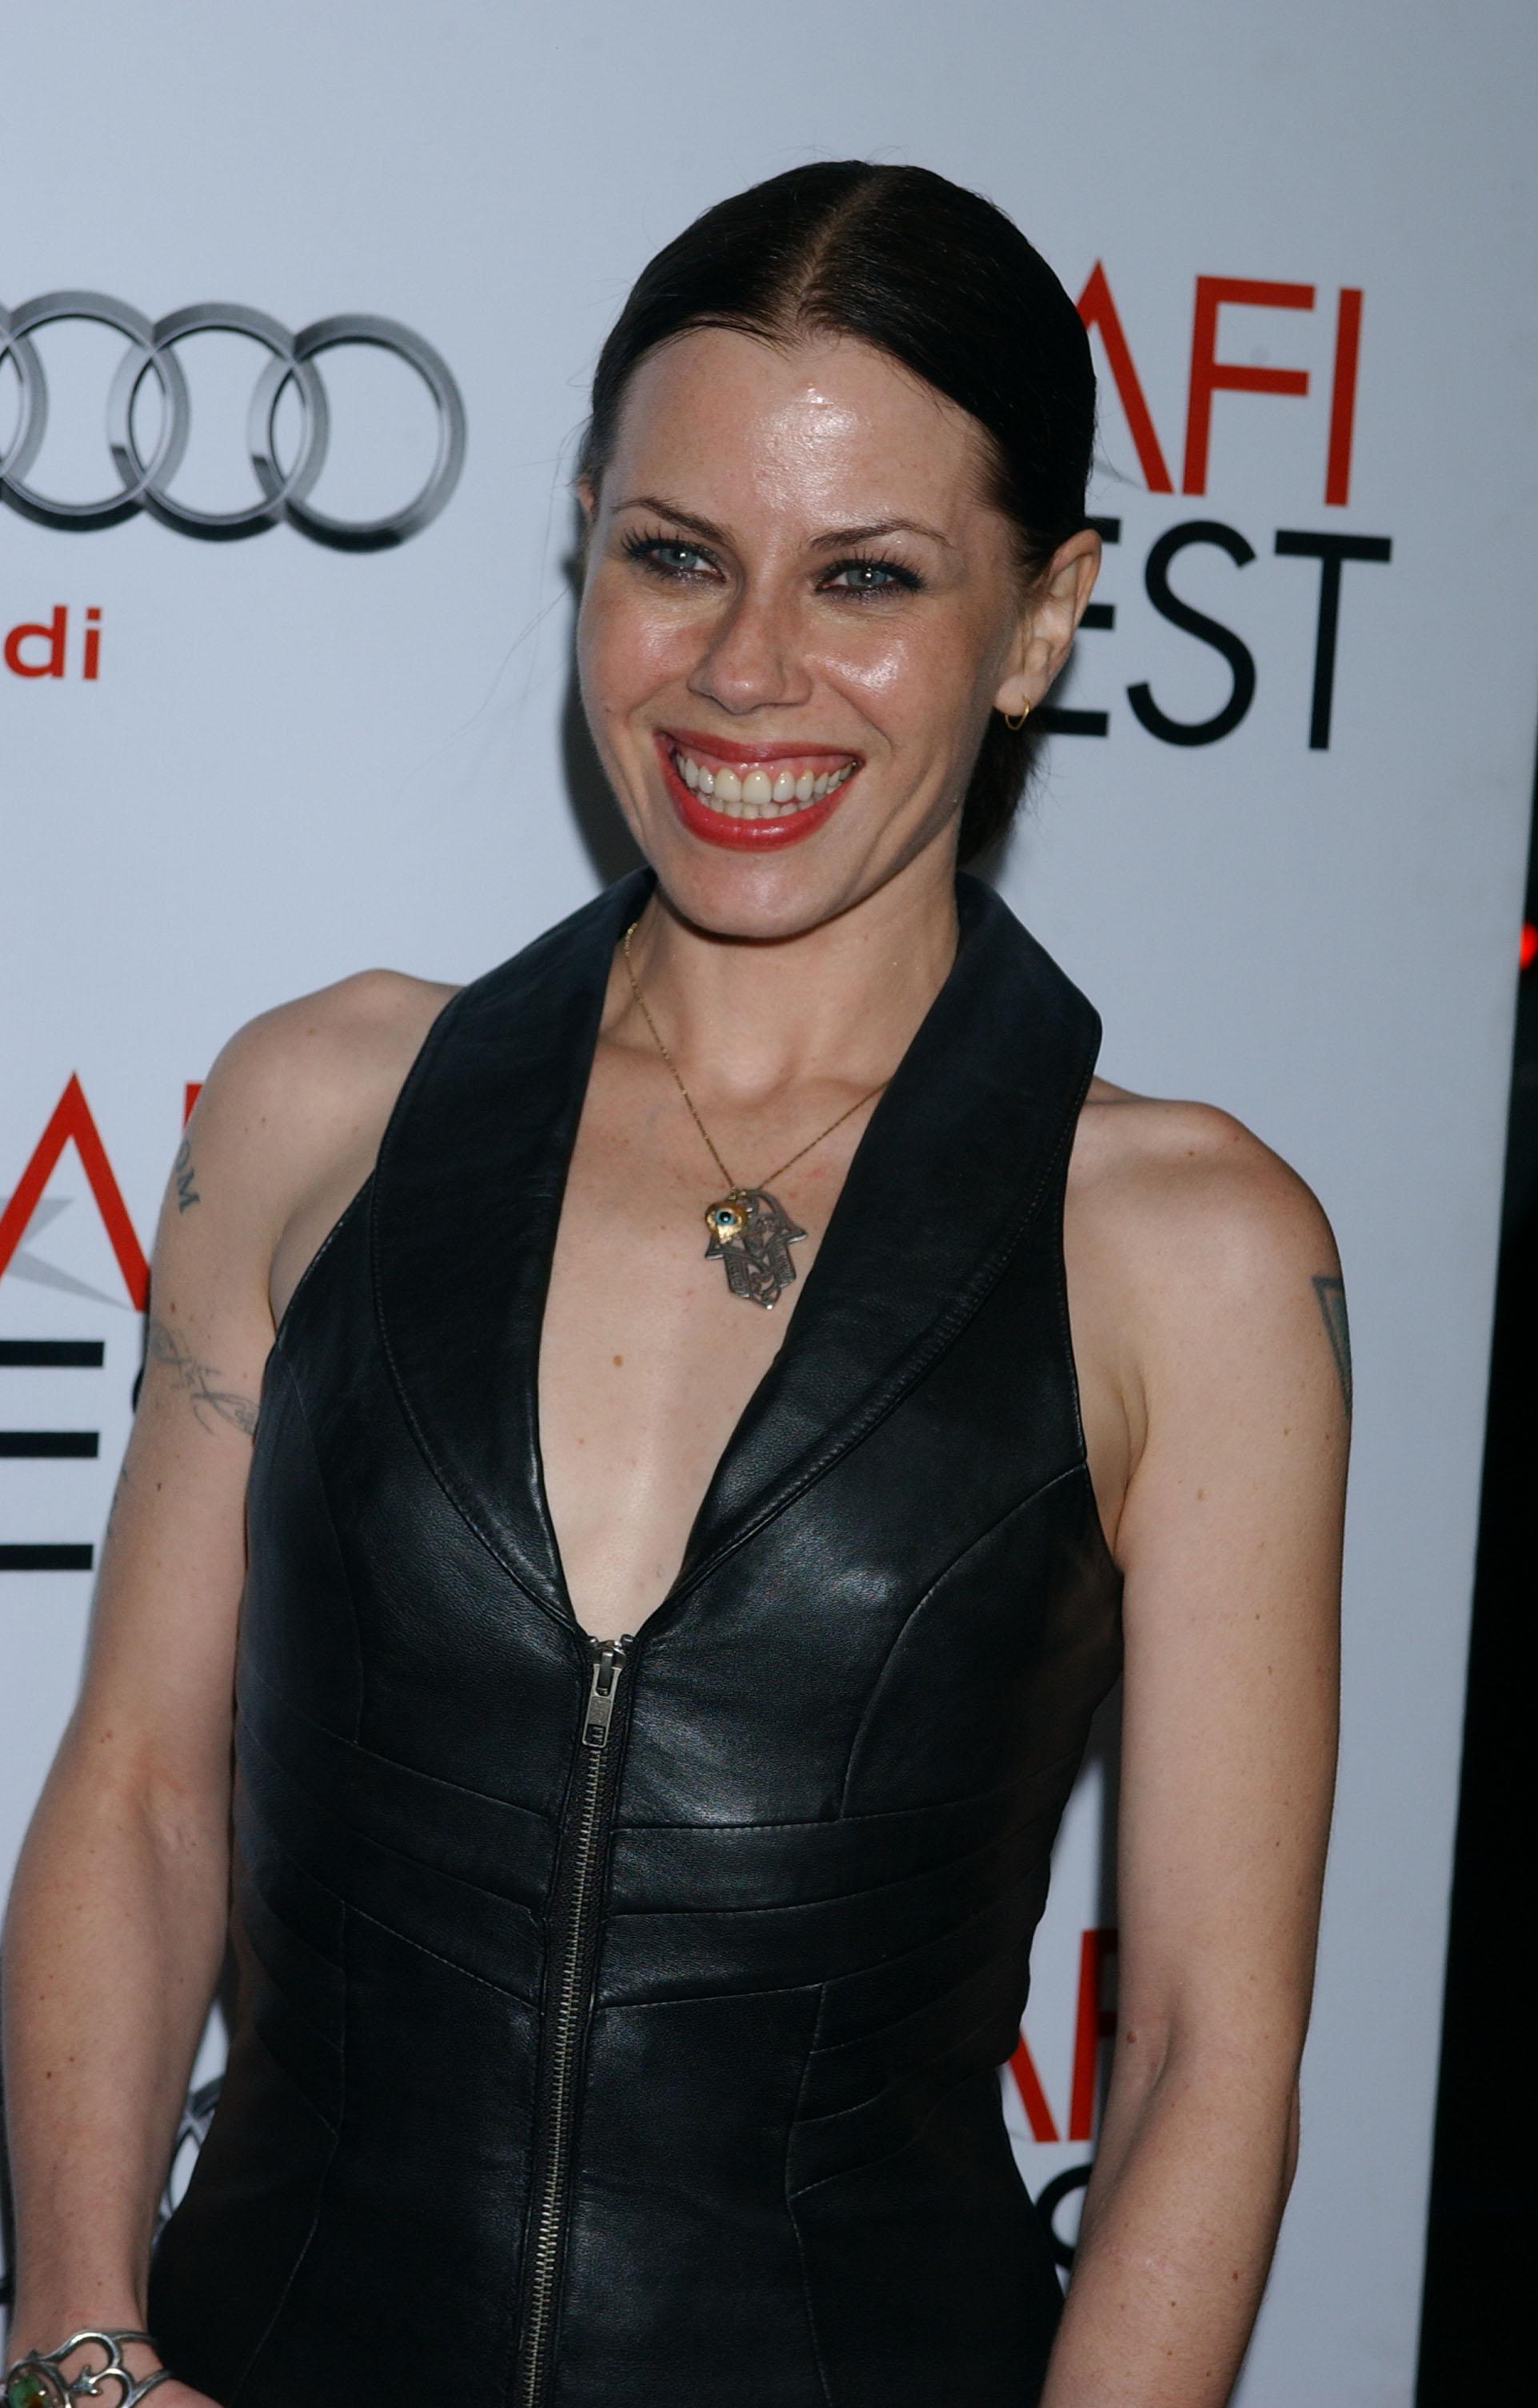 Kristen Stewart - On the Road screening at AFI Fest 2012